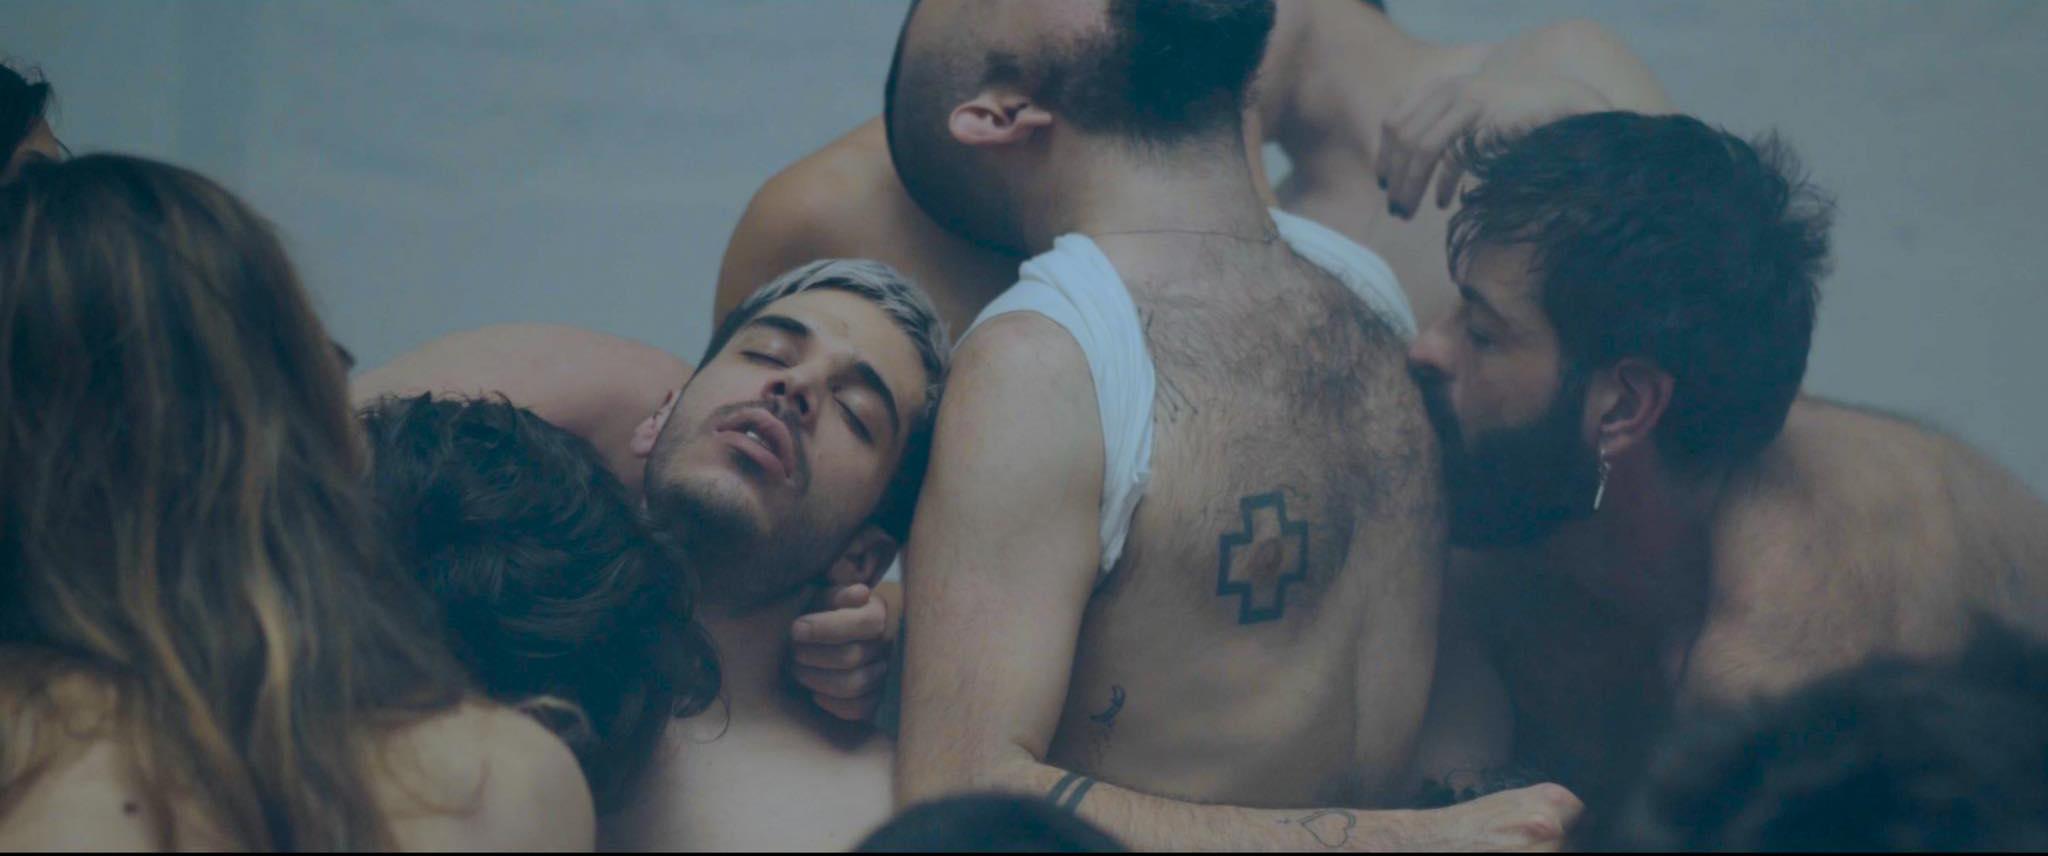 orgias gays en madrid jaén